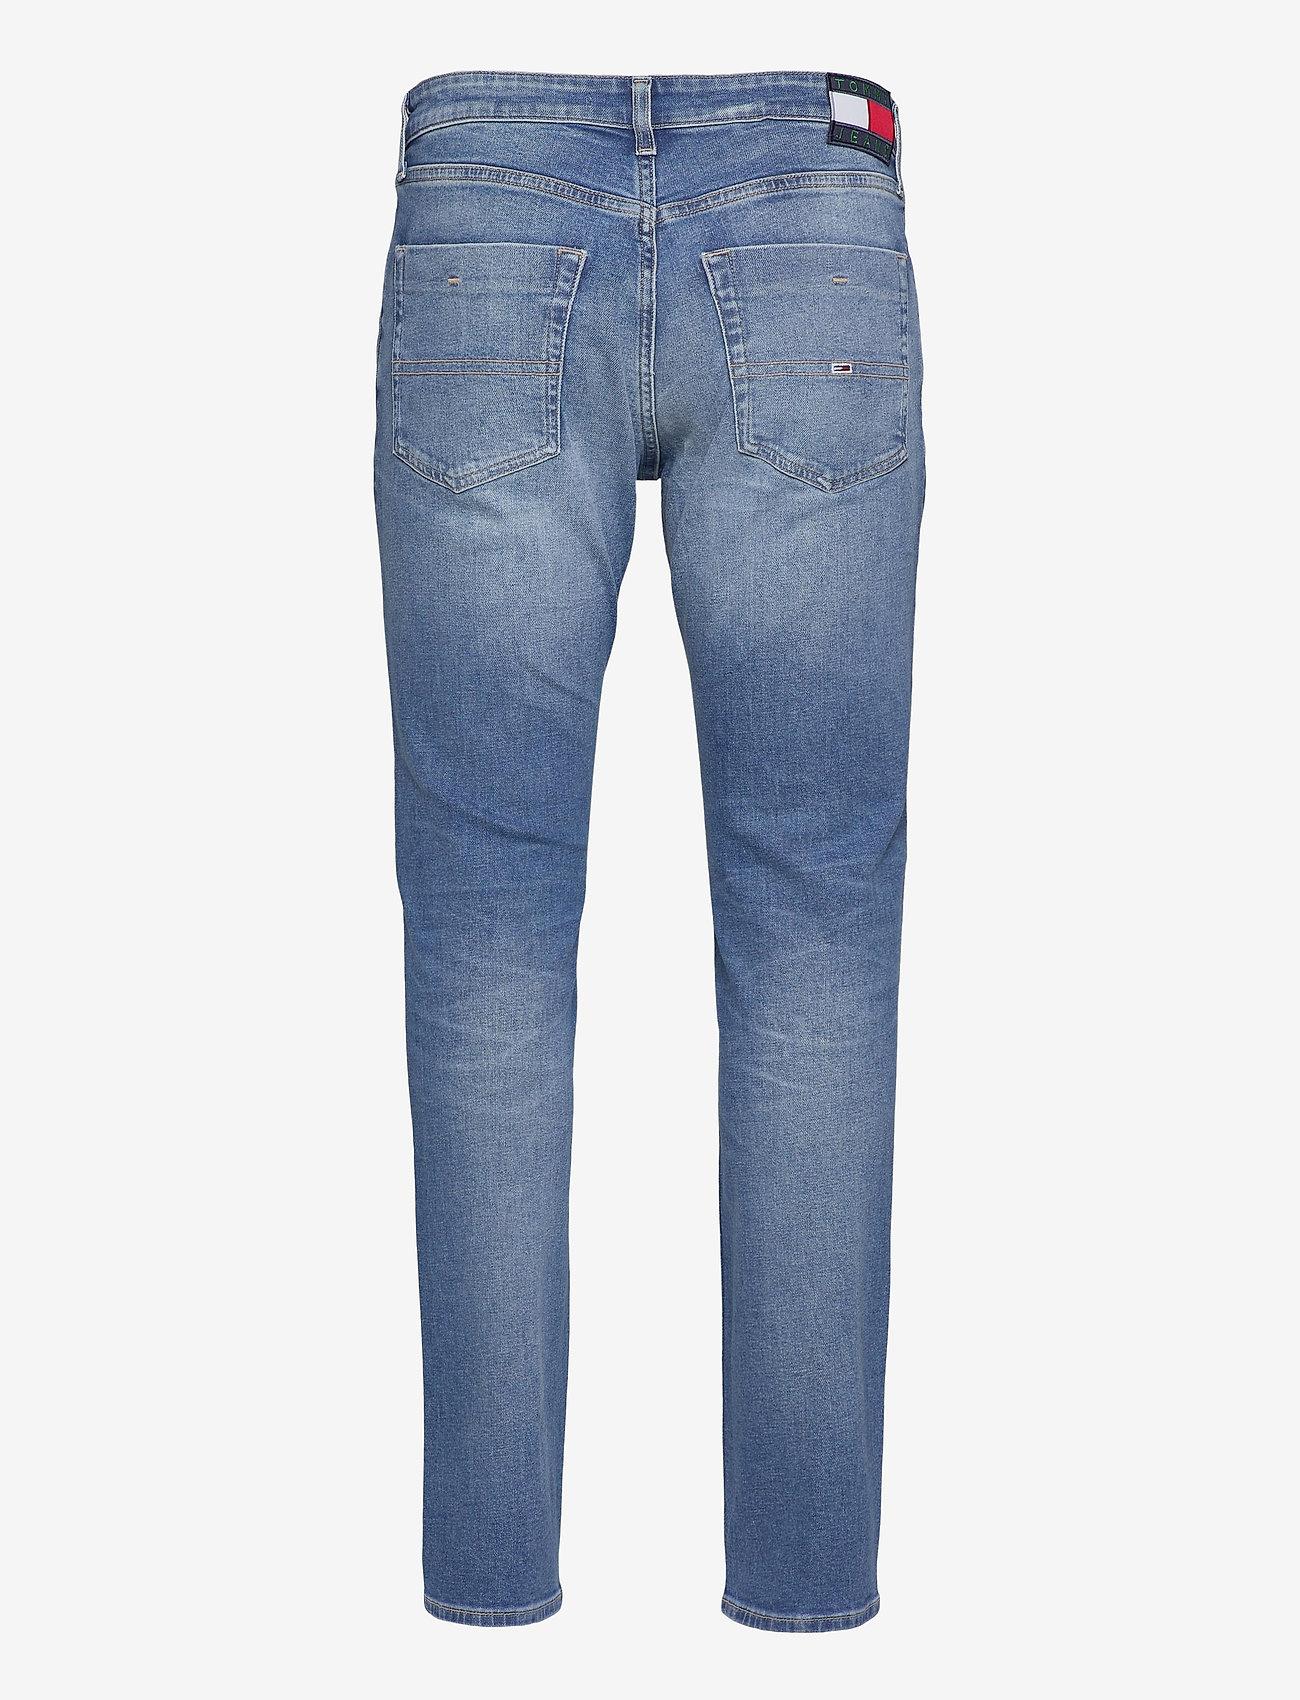 Tommy Jeans - SCANTON SLIM SSPMBC - slim jeans - save sp mb com - 1